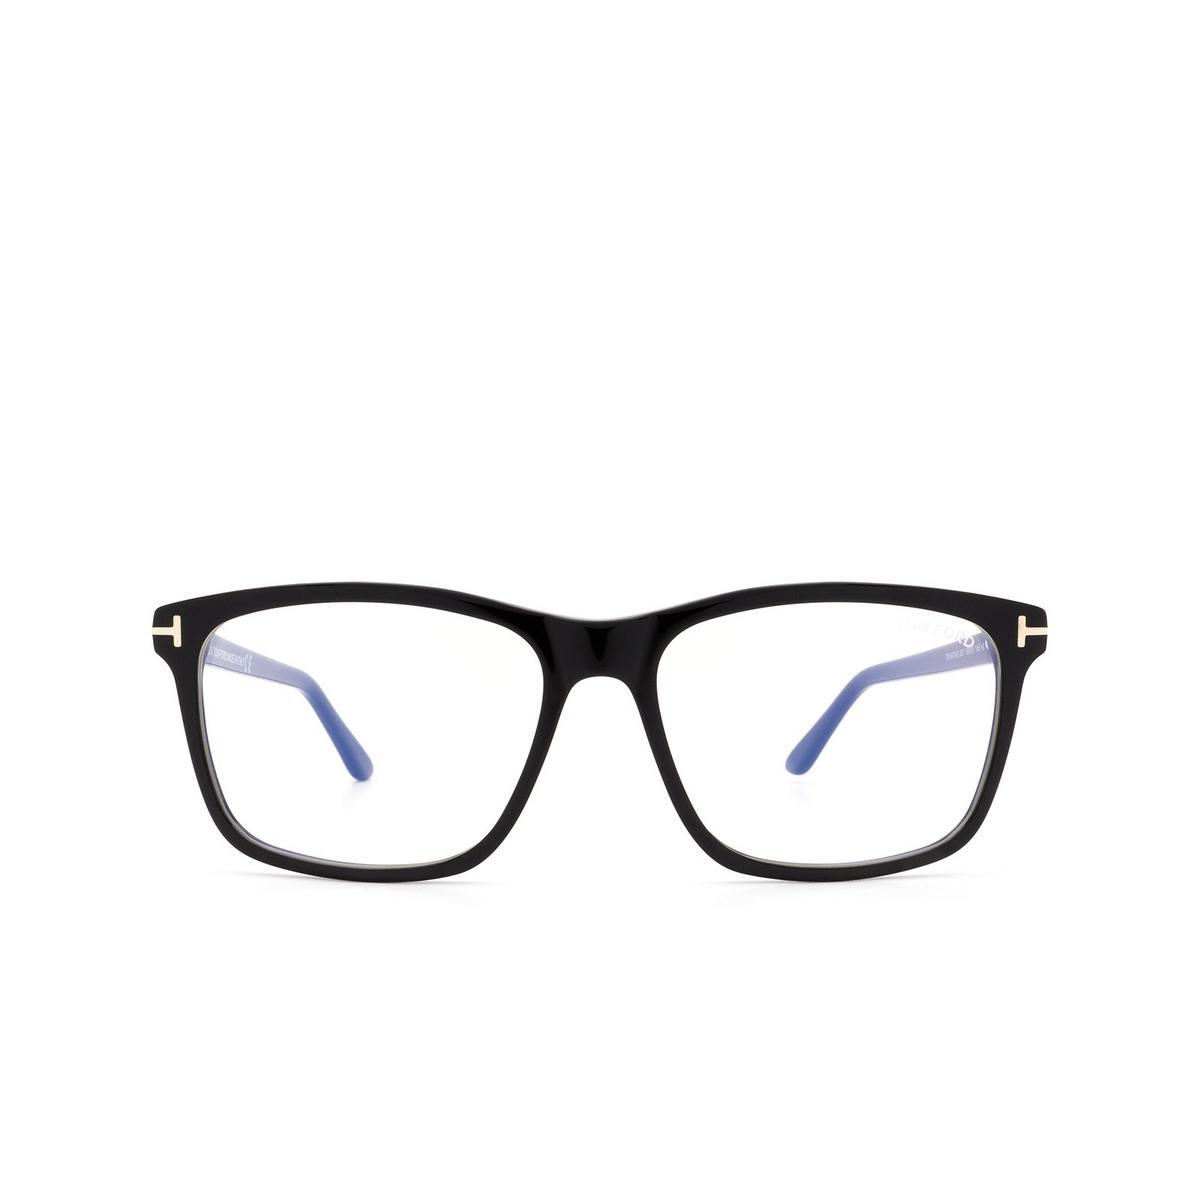 Tom Ford® Square Eyeglasses: FT5479-B color Shiny Black 001 - front view.